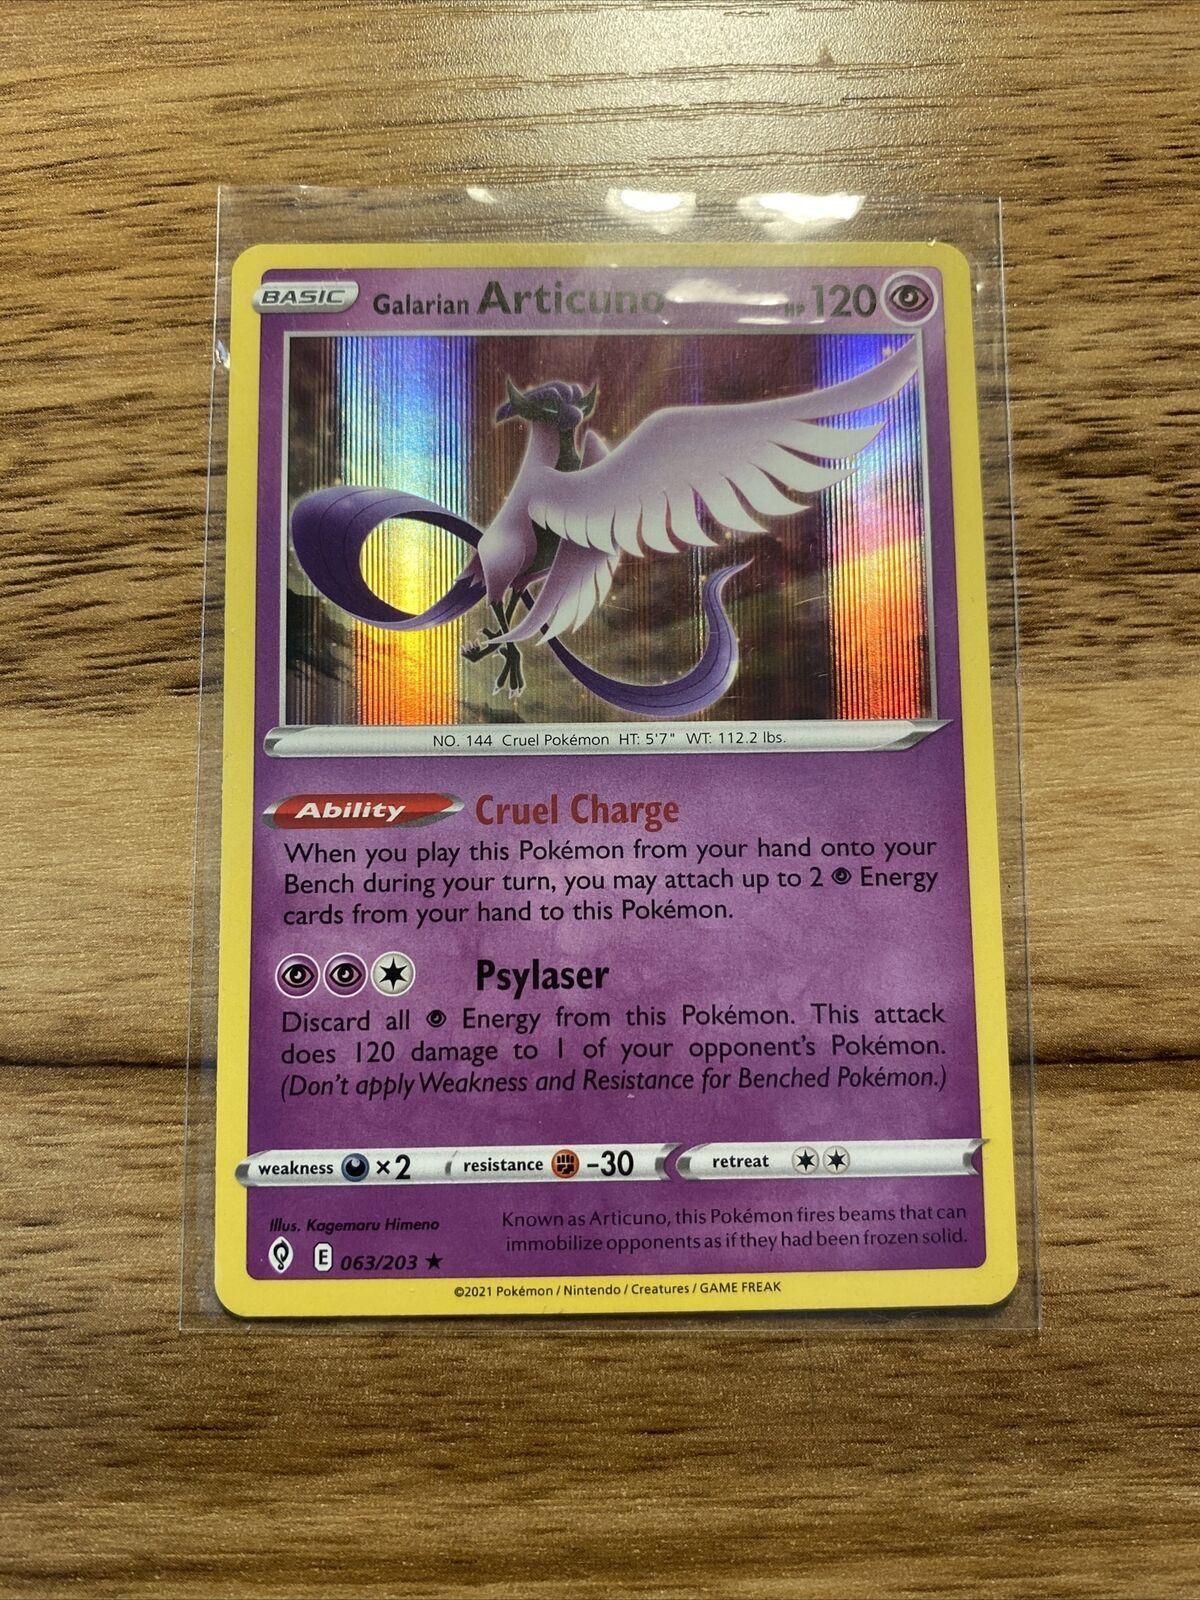 Galarian Articuno 063/203 Holo Rare Evolving Skies Pokemon Card Near Mint - Mint